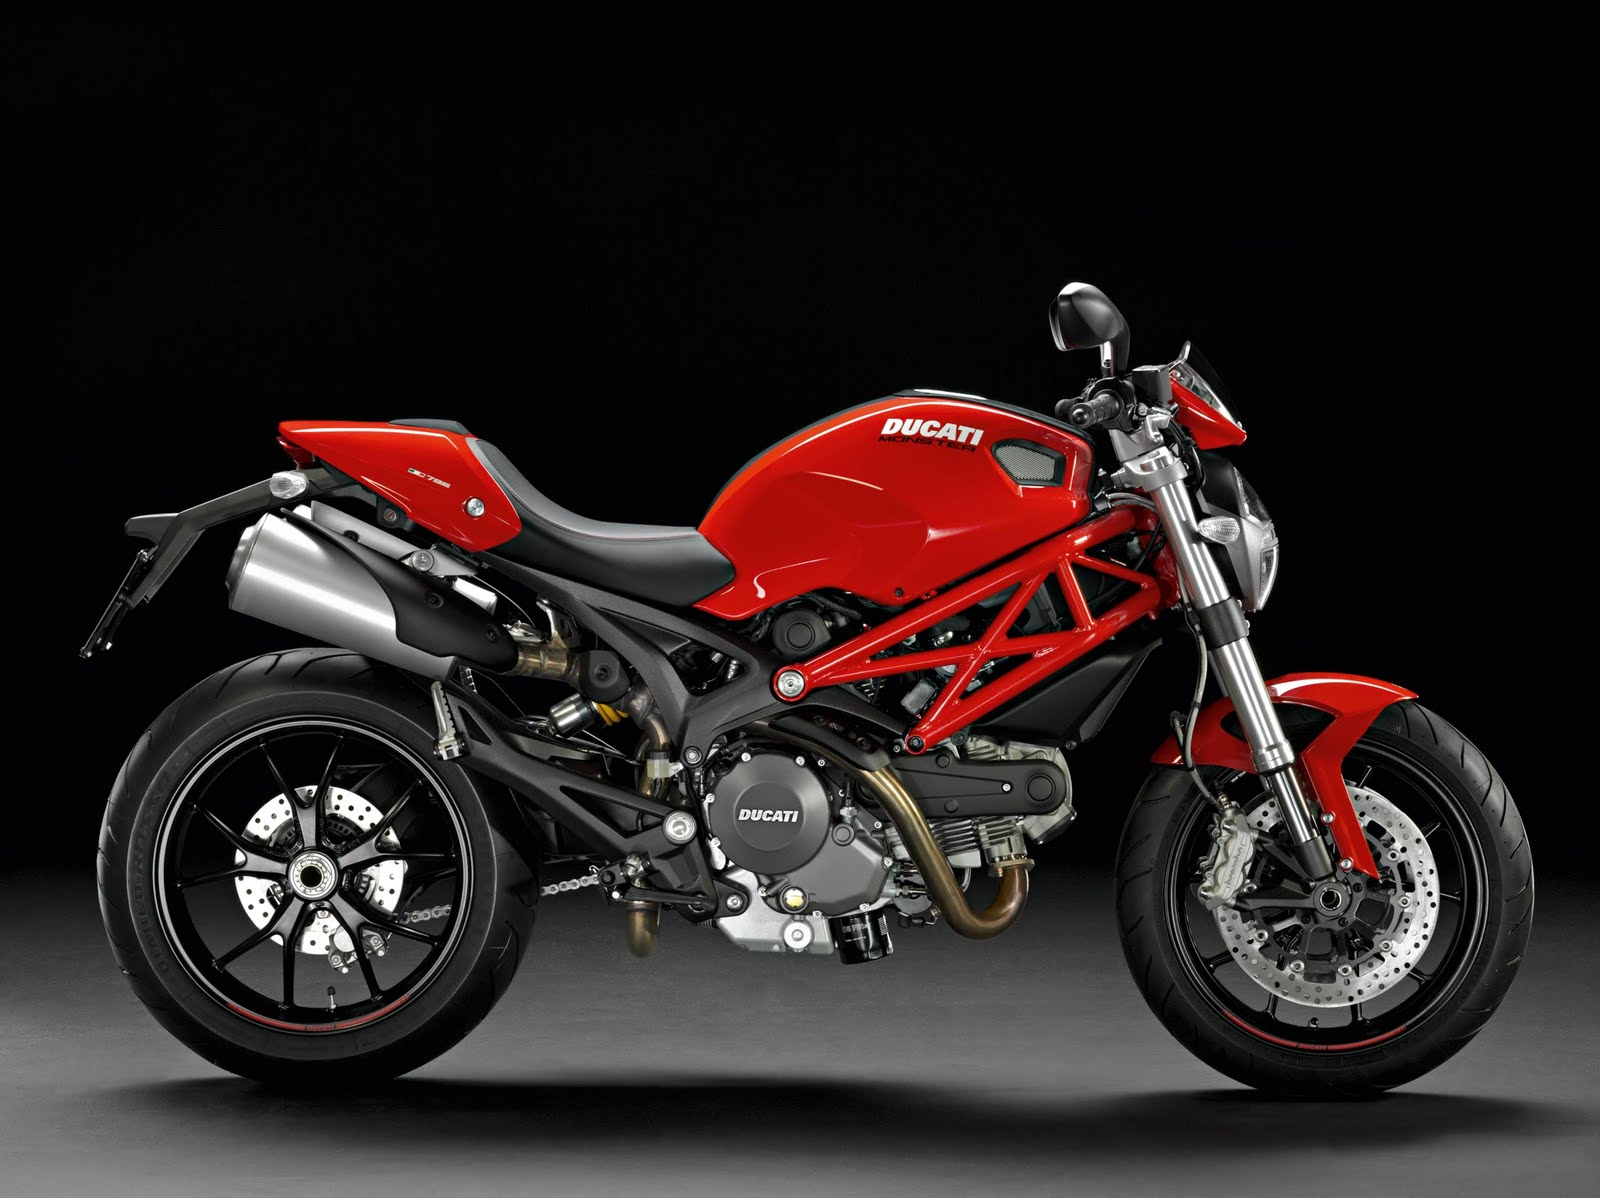 фото, красный байк, мотоцикл, обои